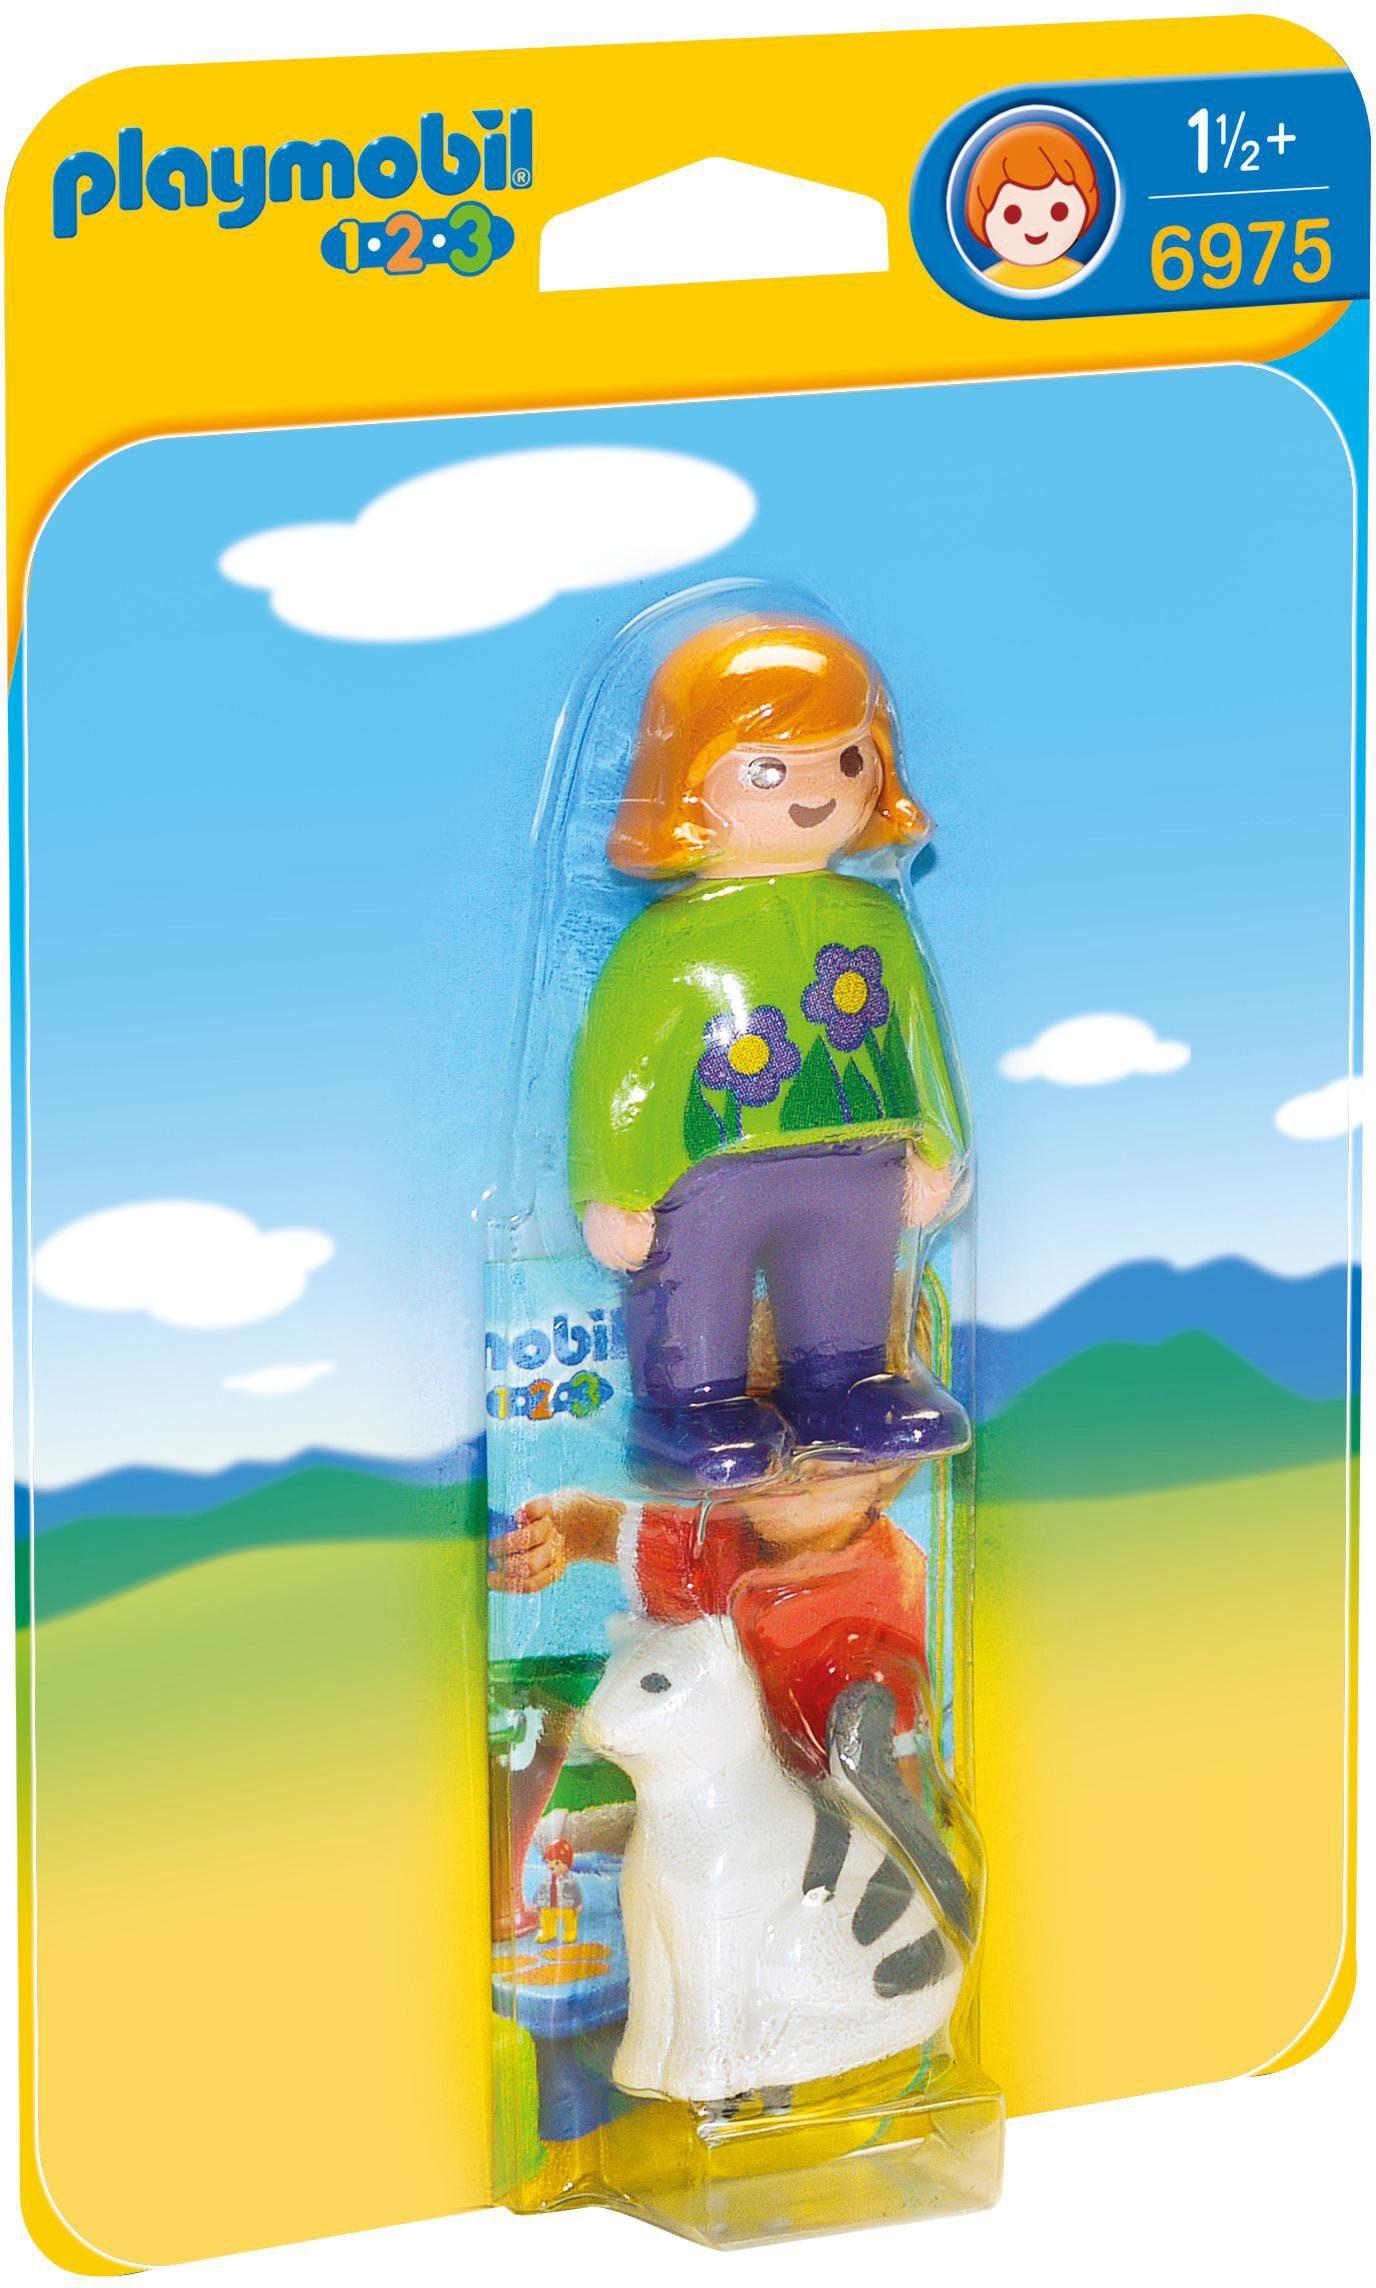 Playmobil® Frau mit Katze (6975), »Playmobil 1-2-3«